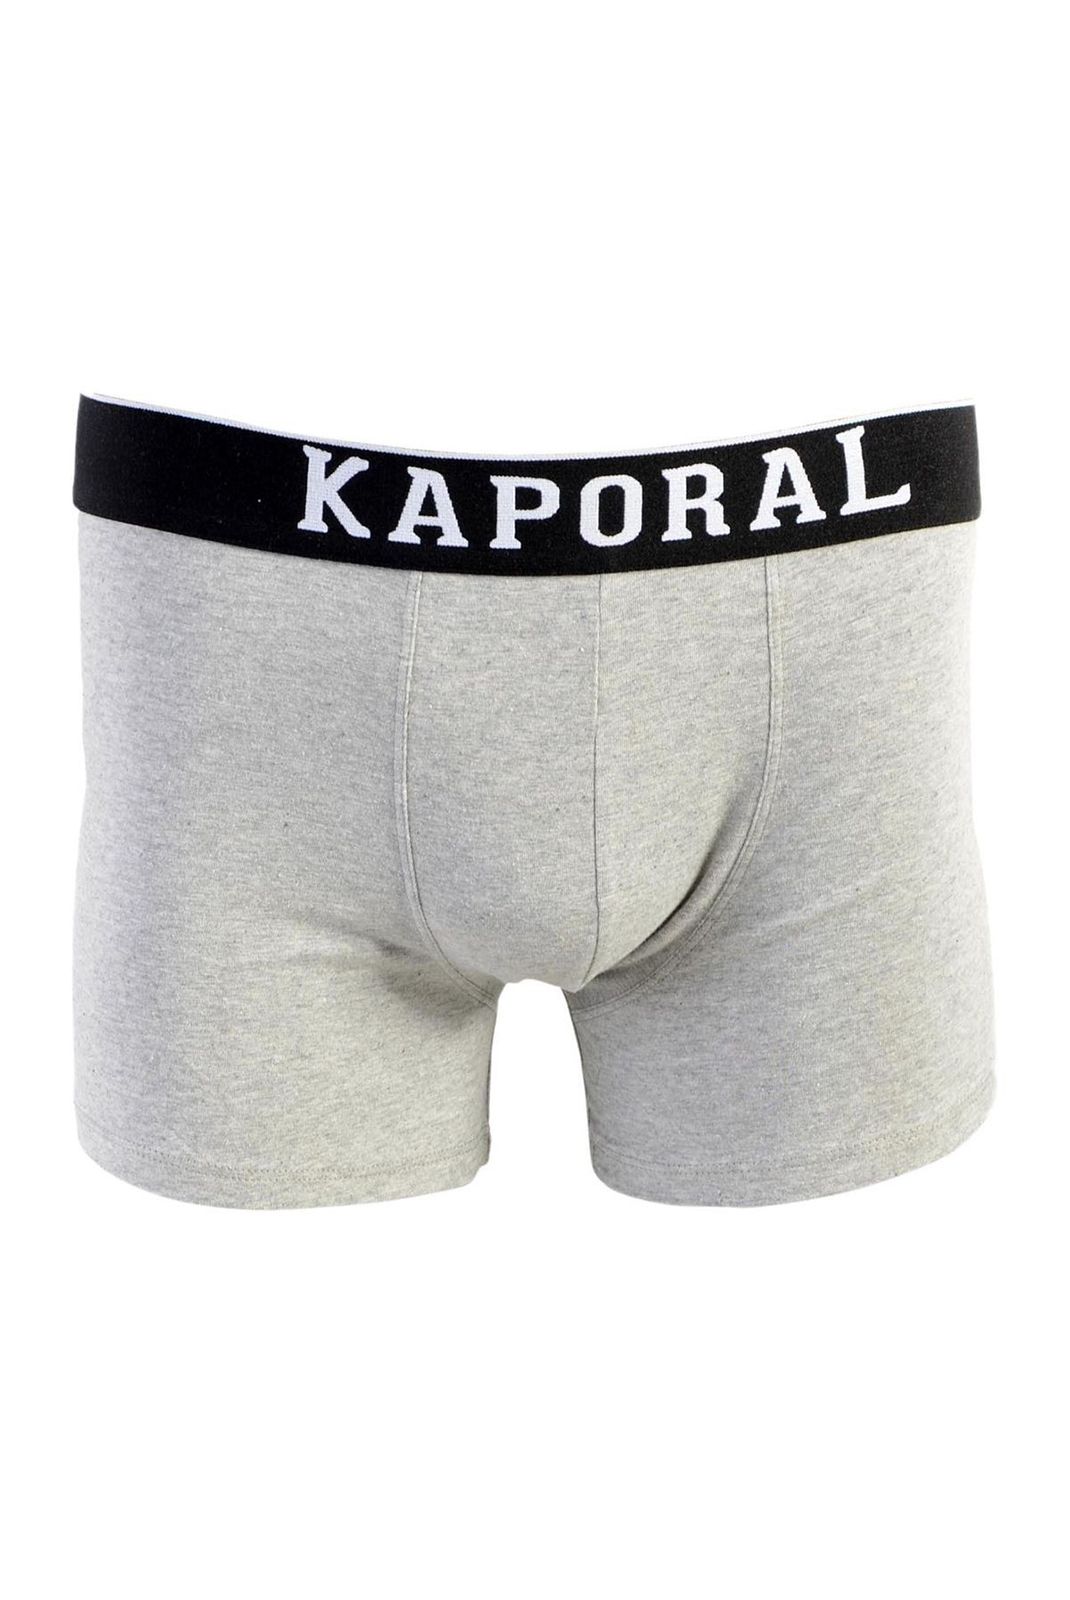 Slips-Caleçons  Kaporal QUAD BLACK/GREY/NAVY